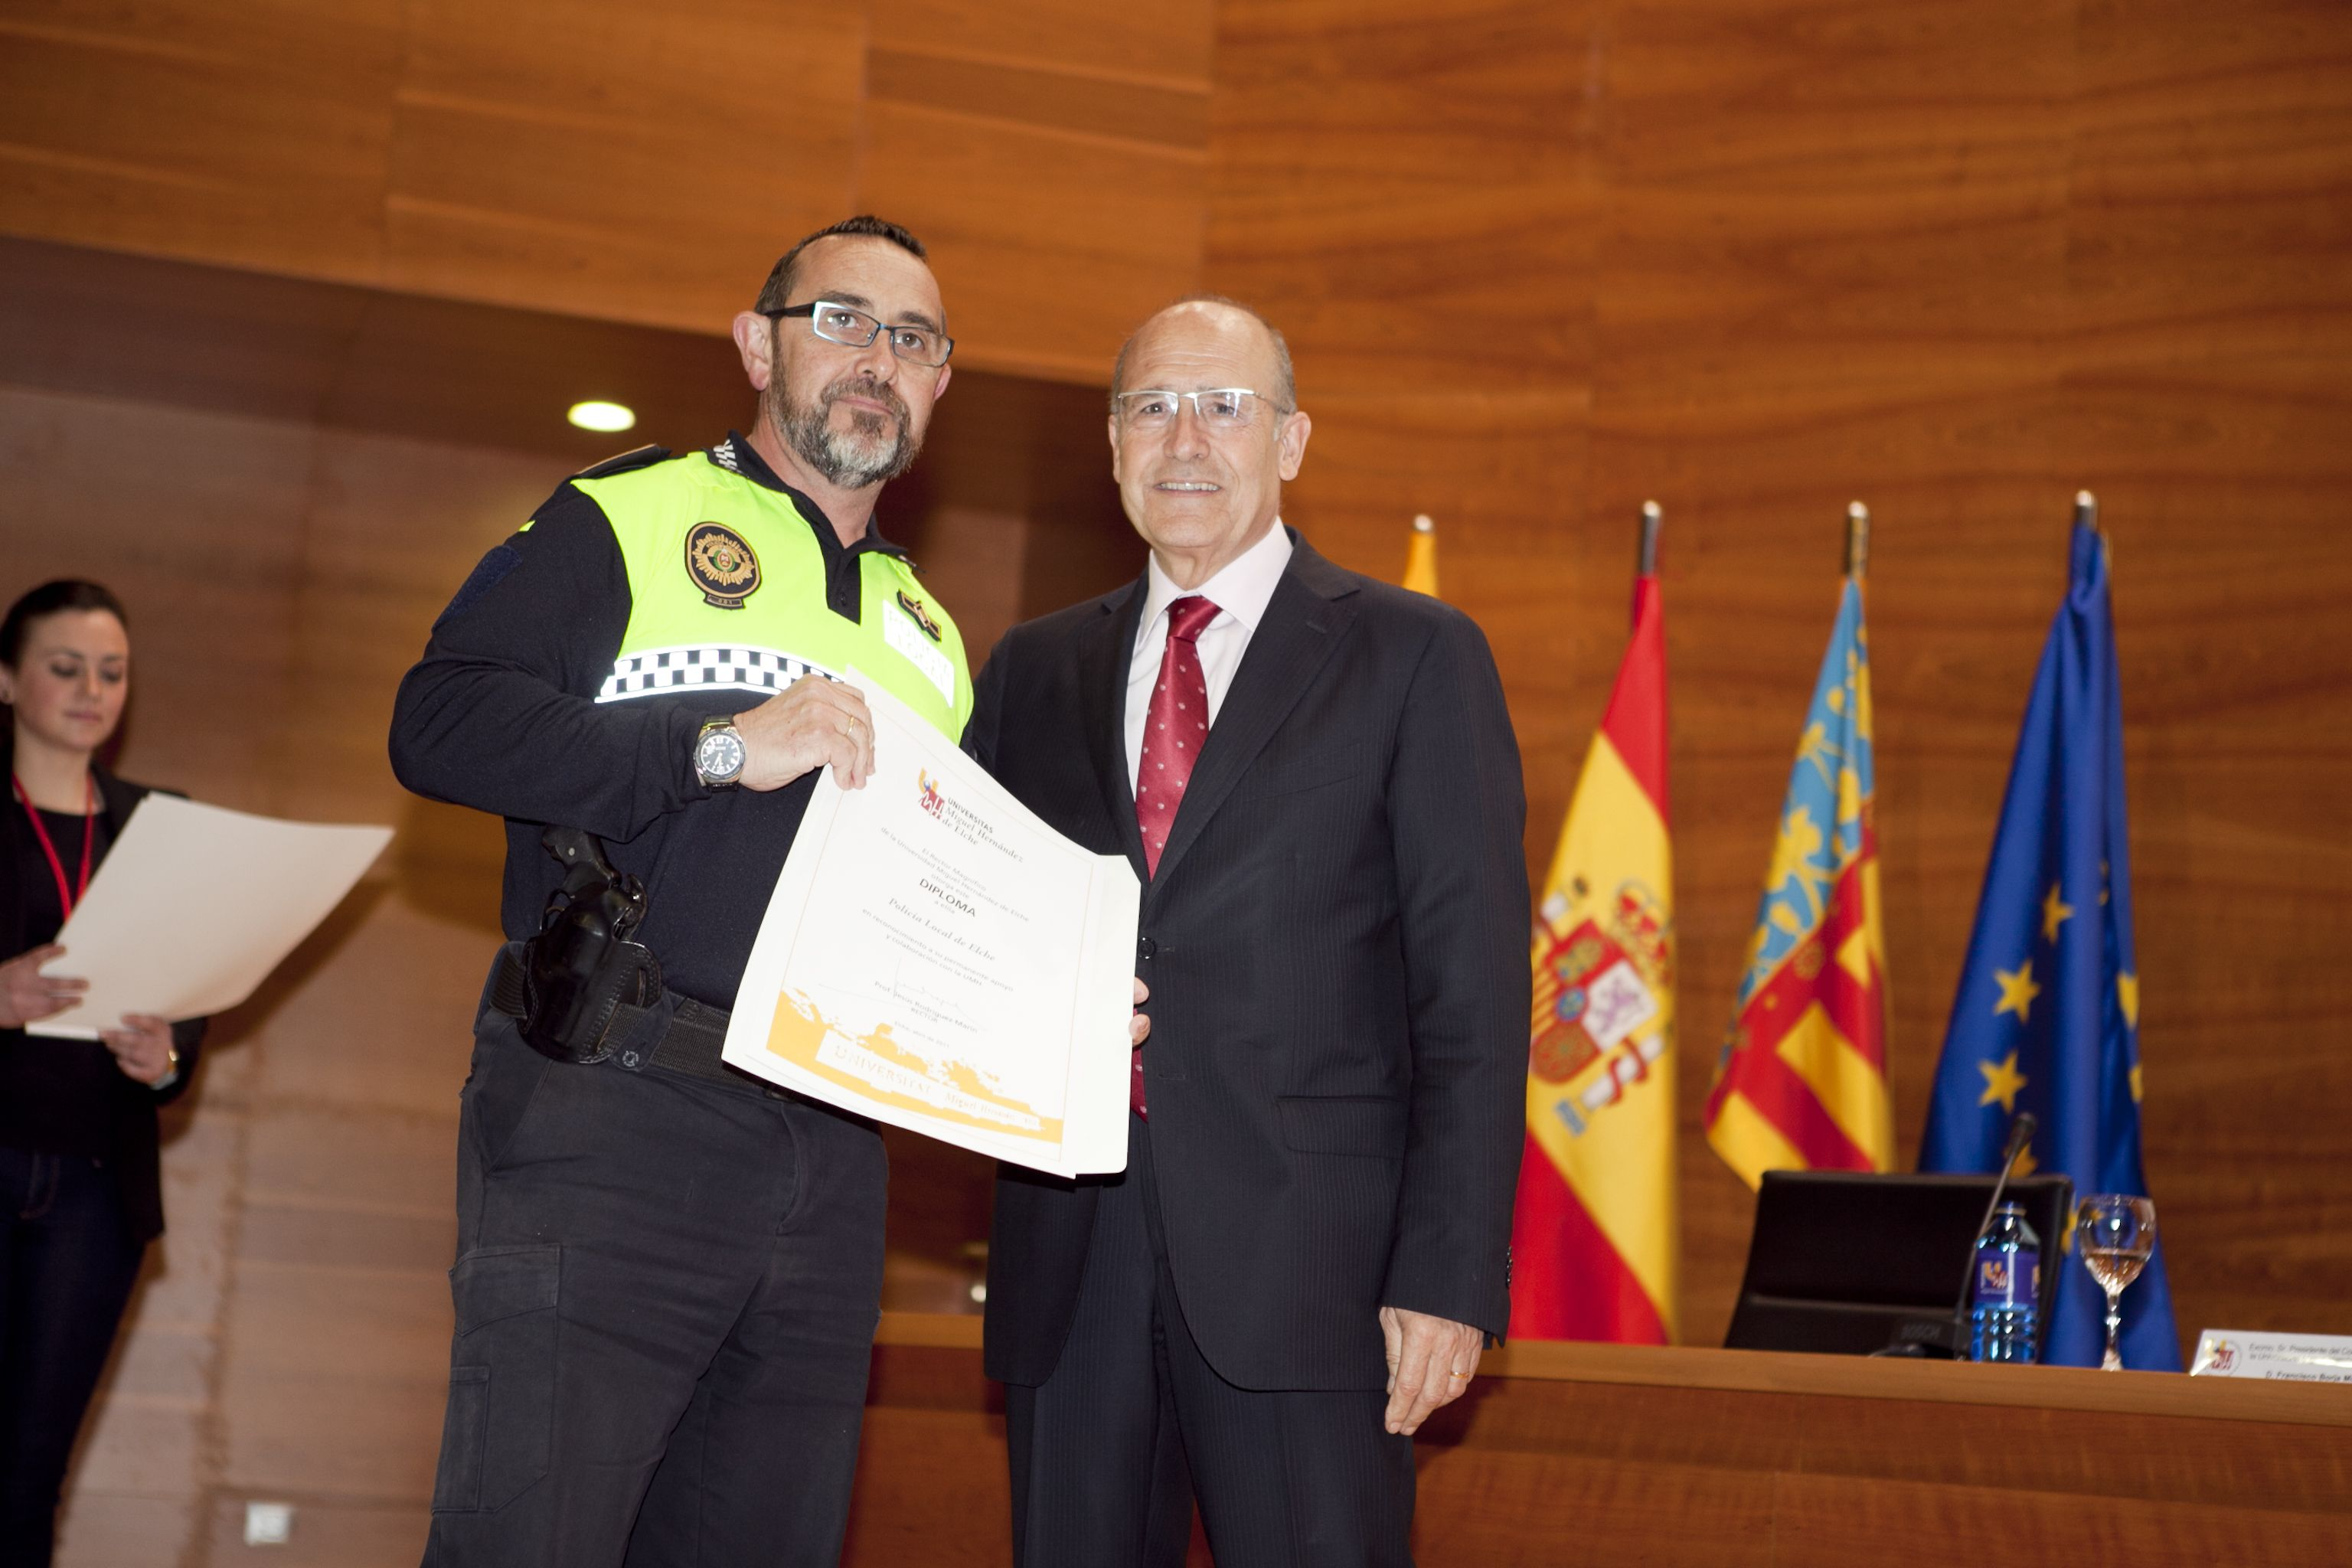 umh-diplomas-rector_mg_7020.jpg